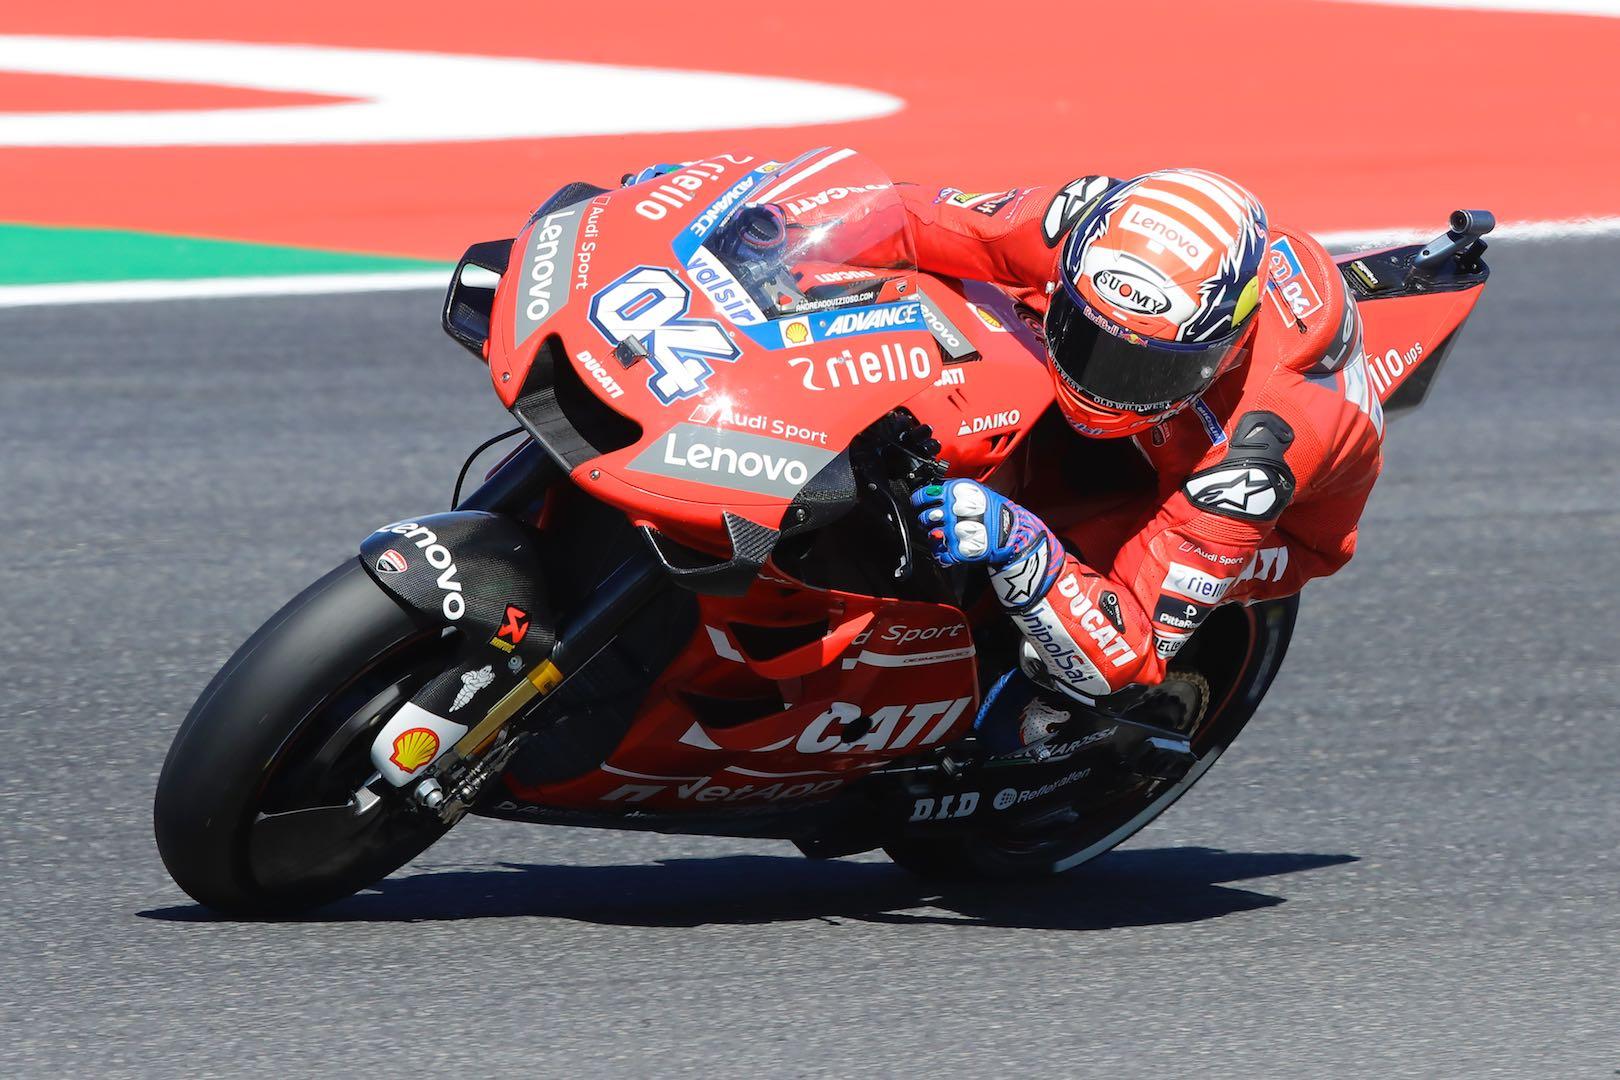 Ducati Andrea Dovizioso MotoGP Qualifying San Marino